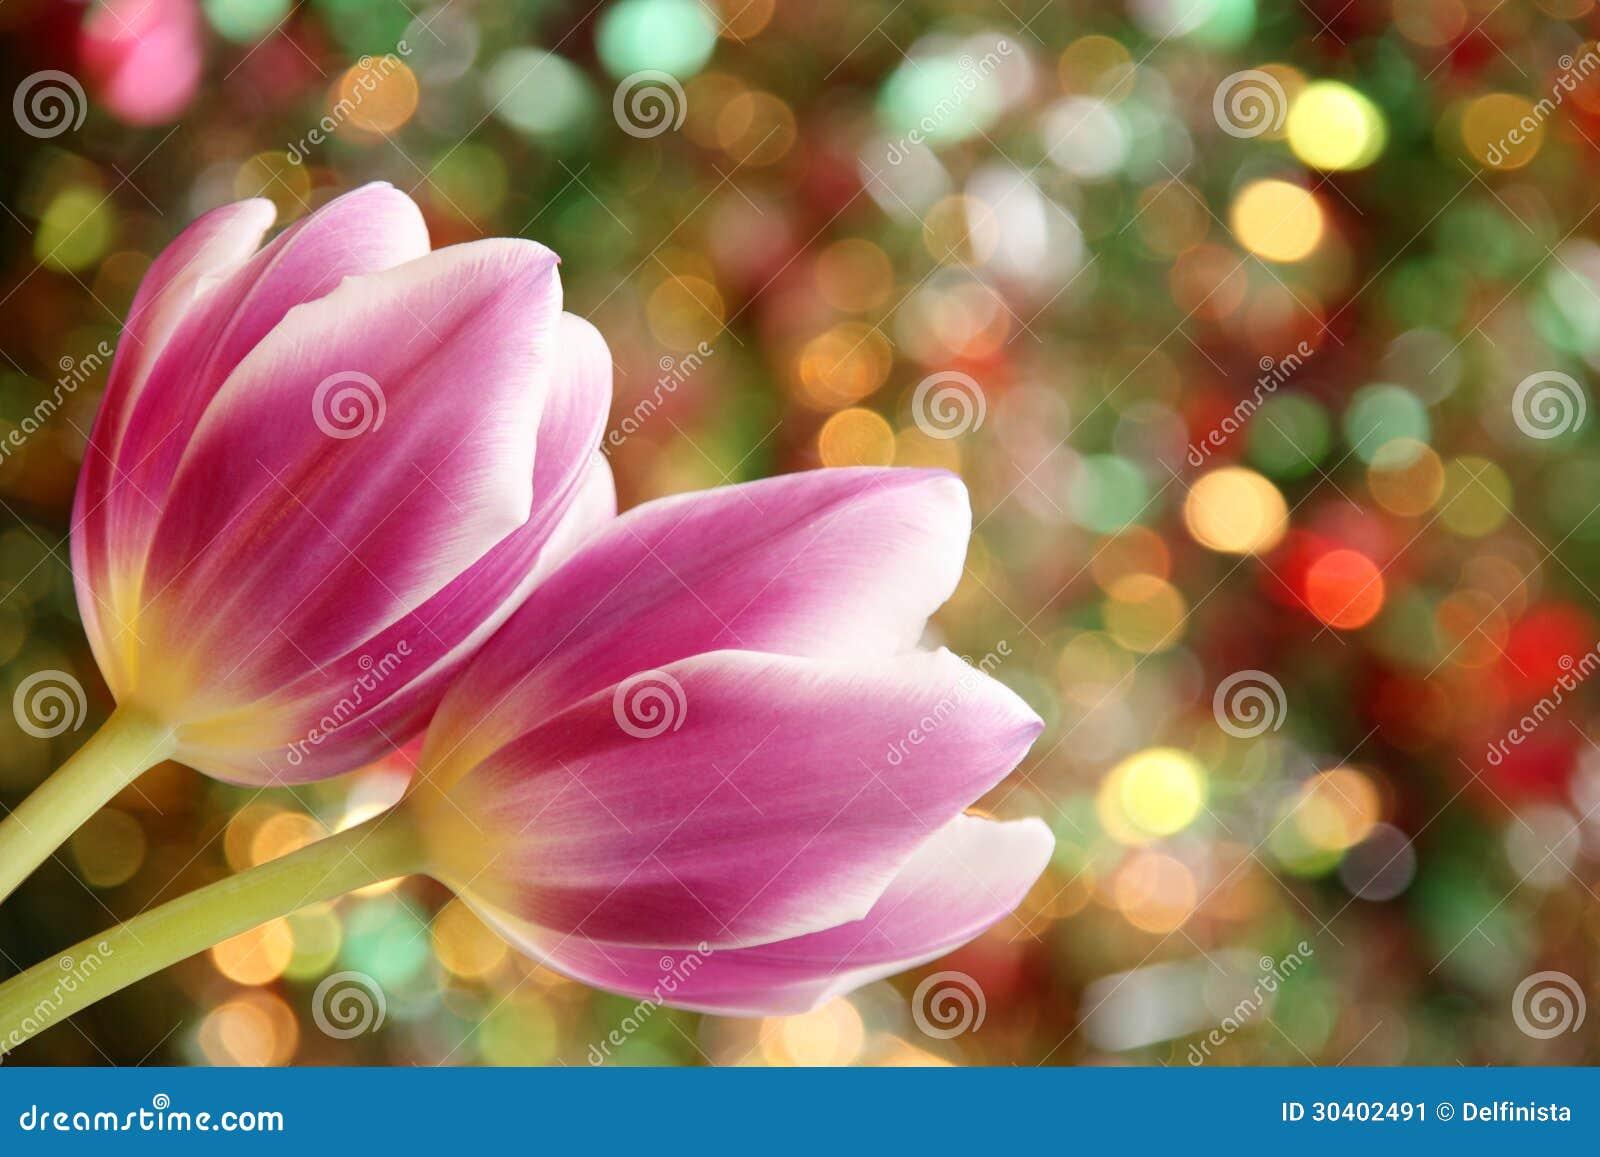 Papel pintado de Tulip Flower - foto de papel de tarjetas de Pascua